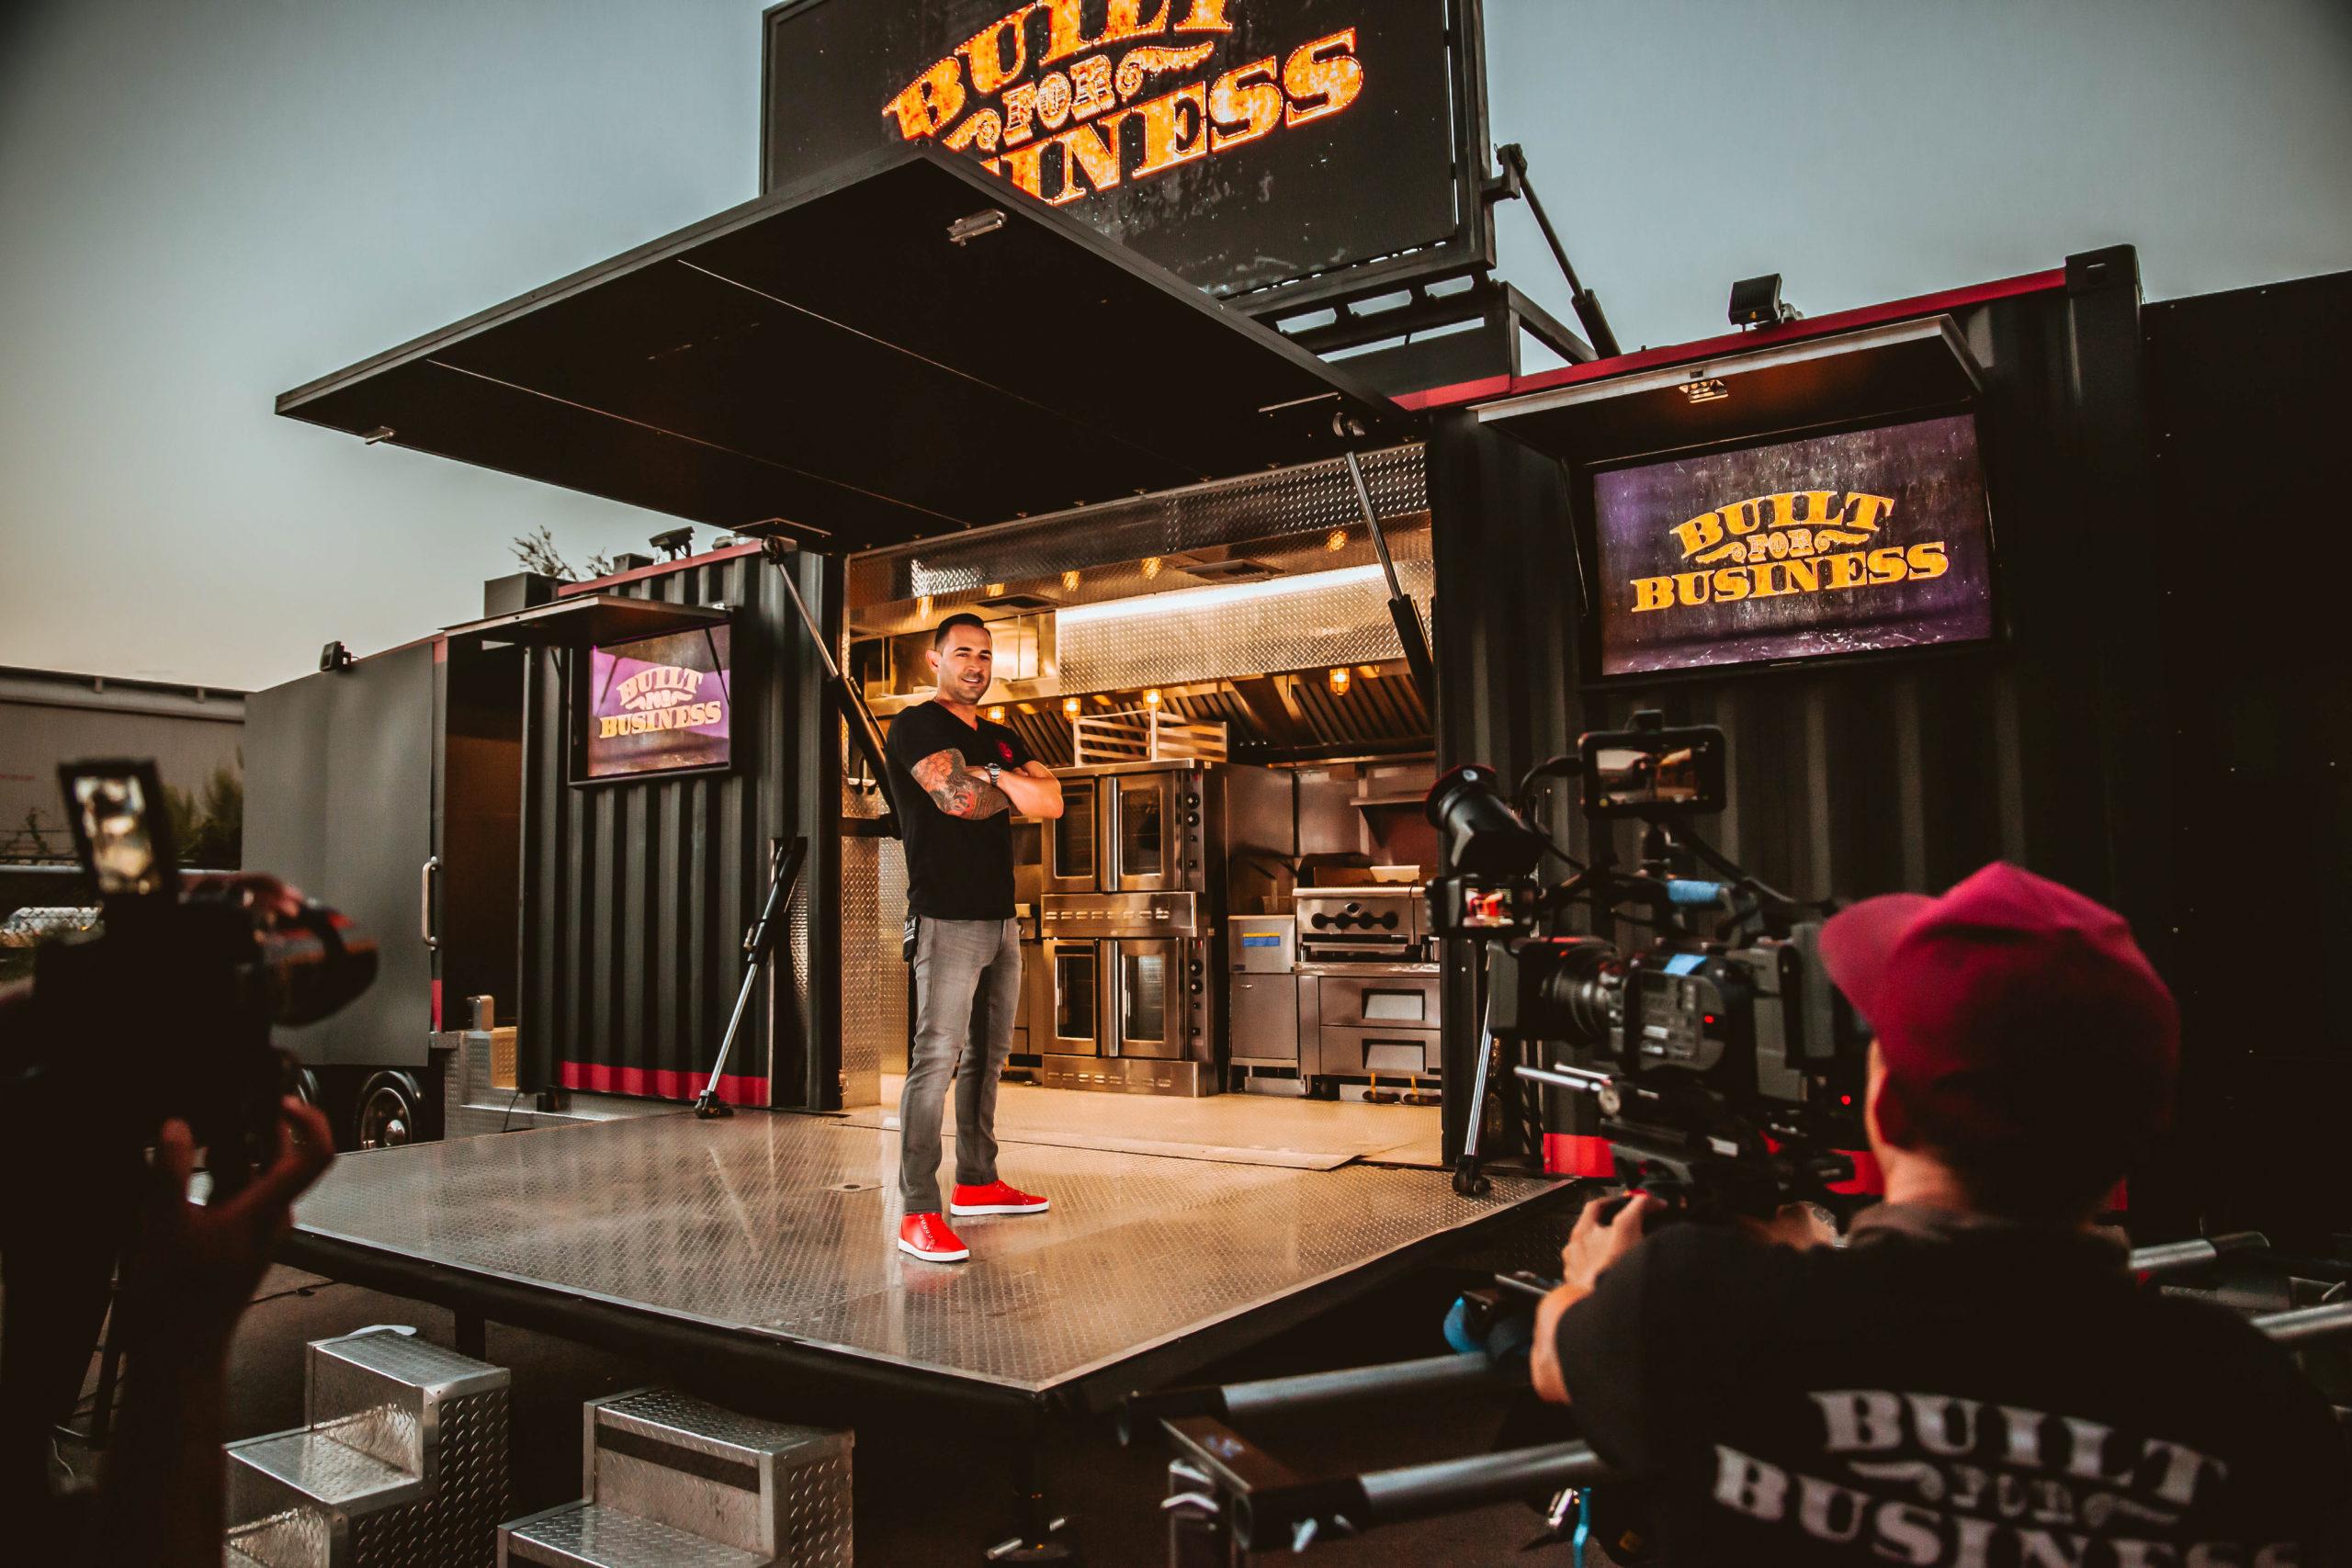 Cameron Davies entertainment san antonio guy to know boxing cruising kitchens food truck